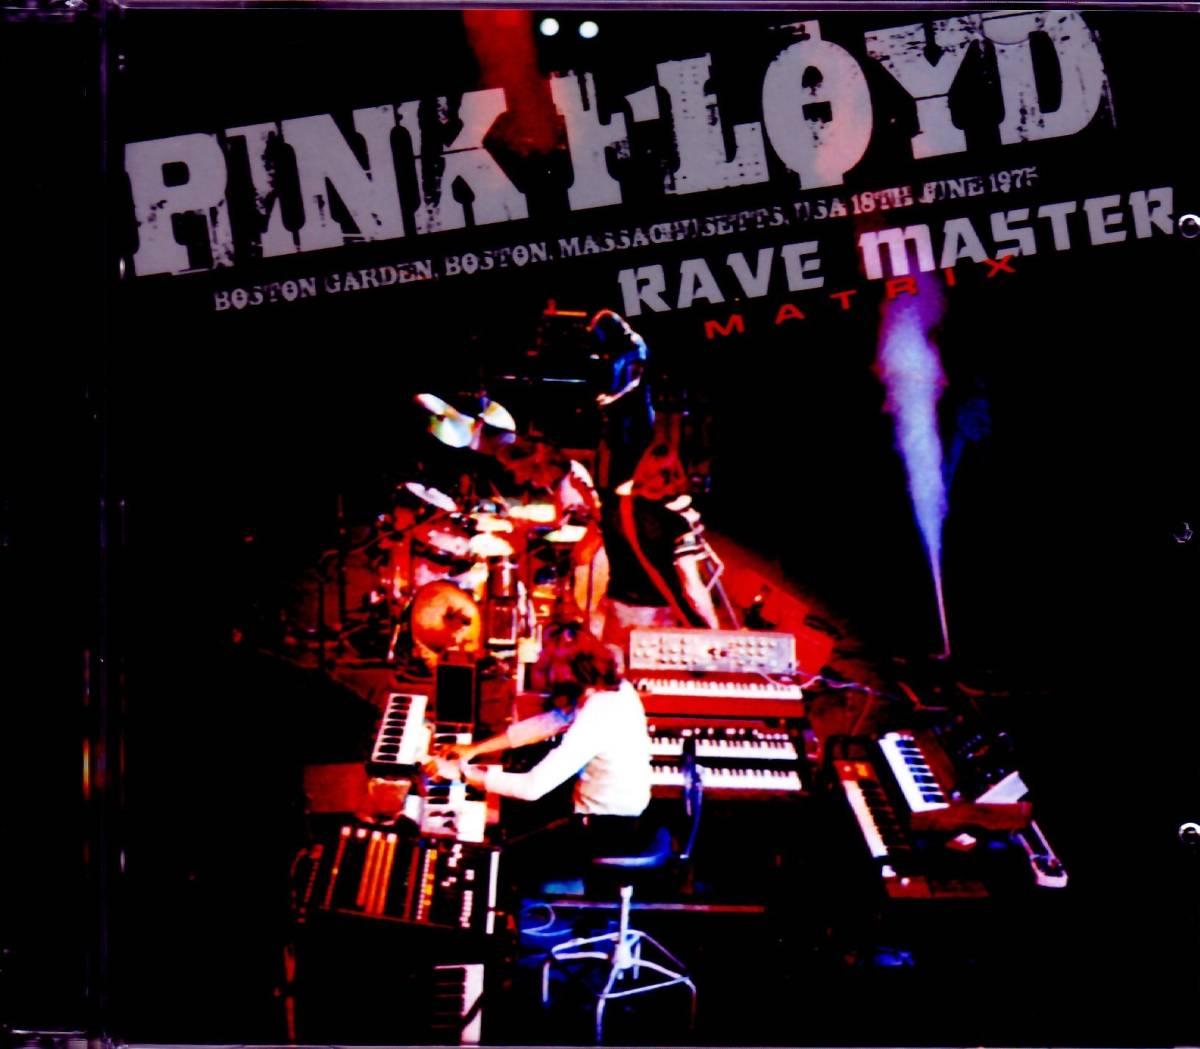 Pink Floyd ピンク・フロイド/Rave Master